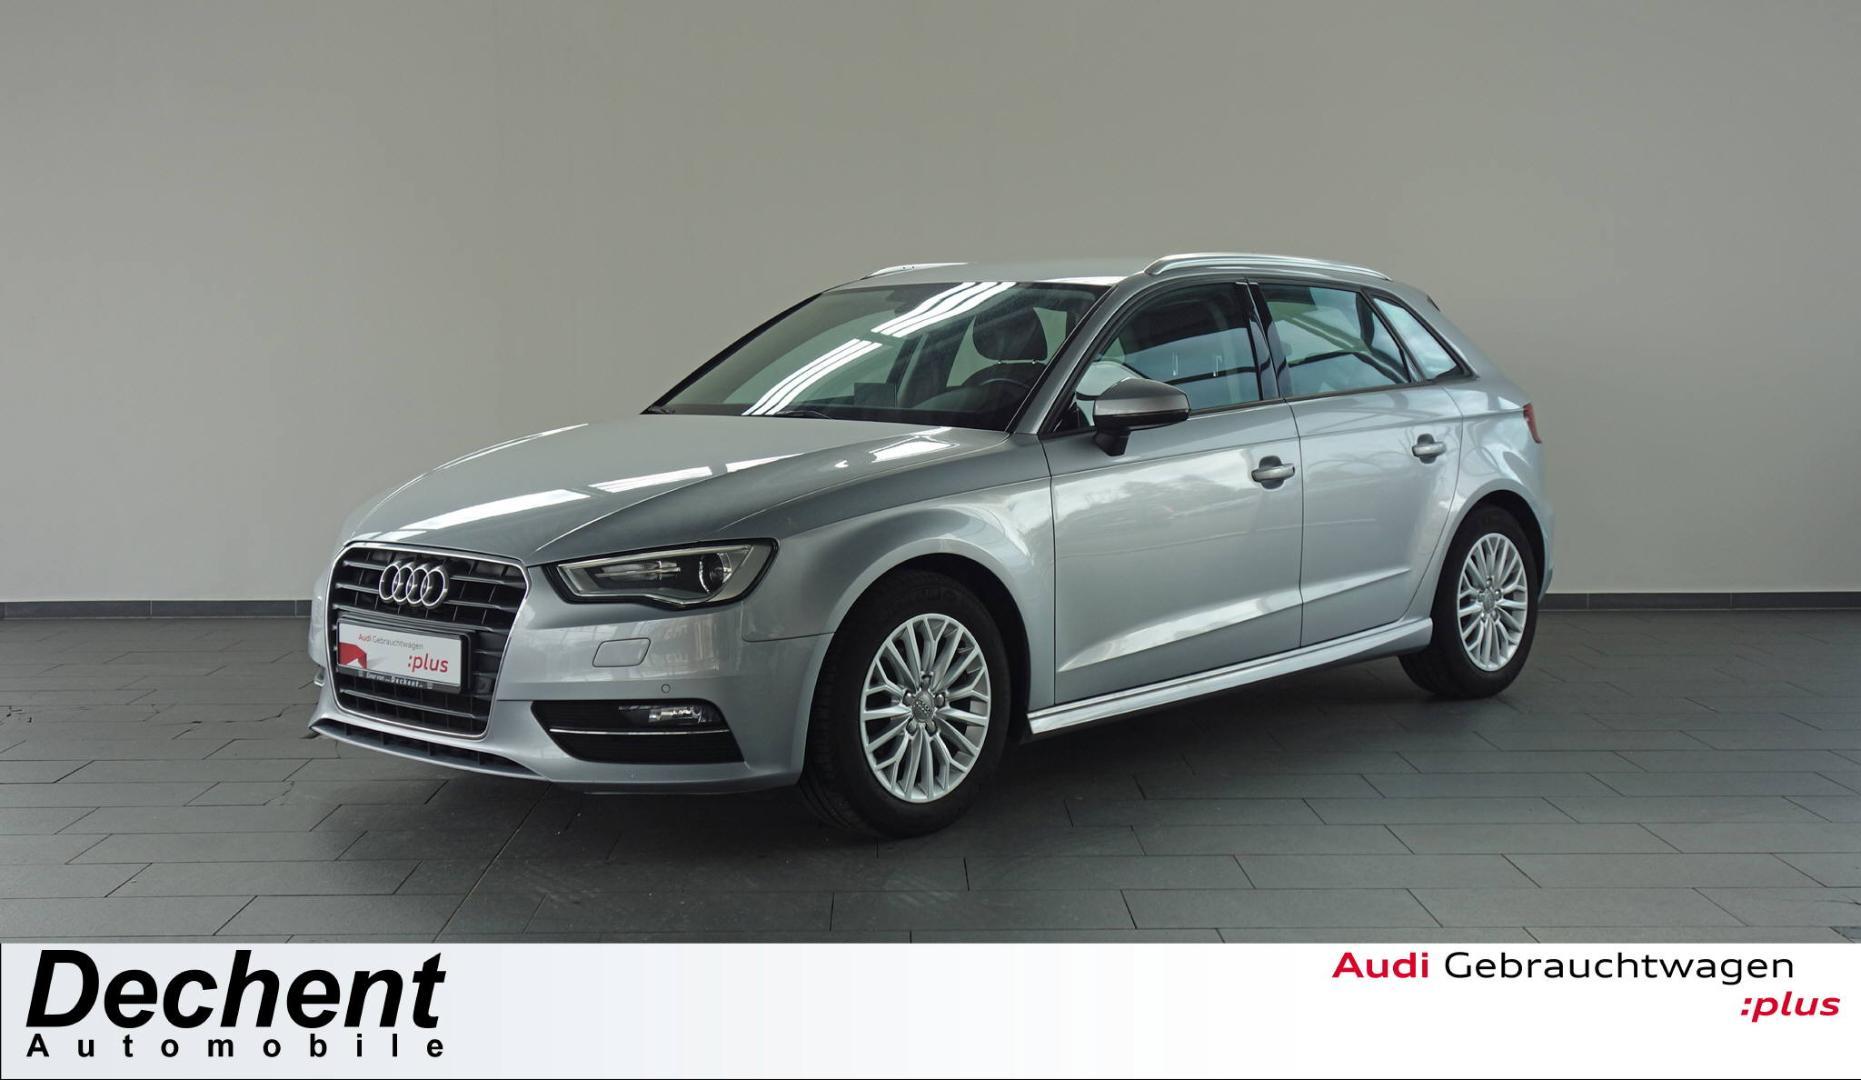 Audi A3 Sportback Attraction 1.6 TDI ultra Navi Plus,, Jahr 2016, Diesel